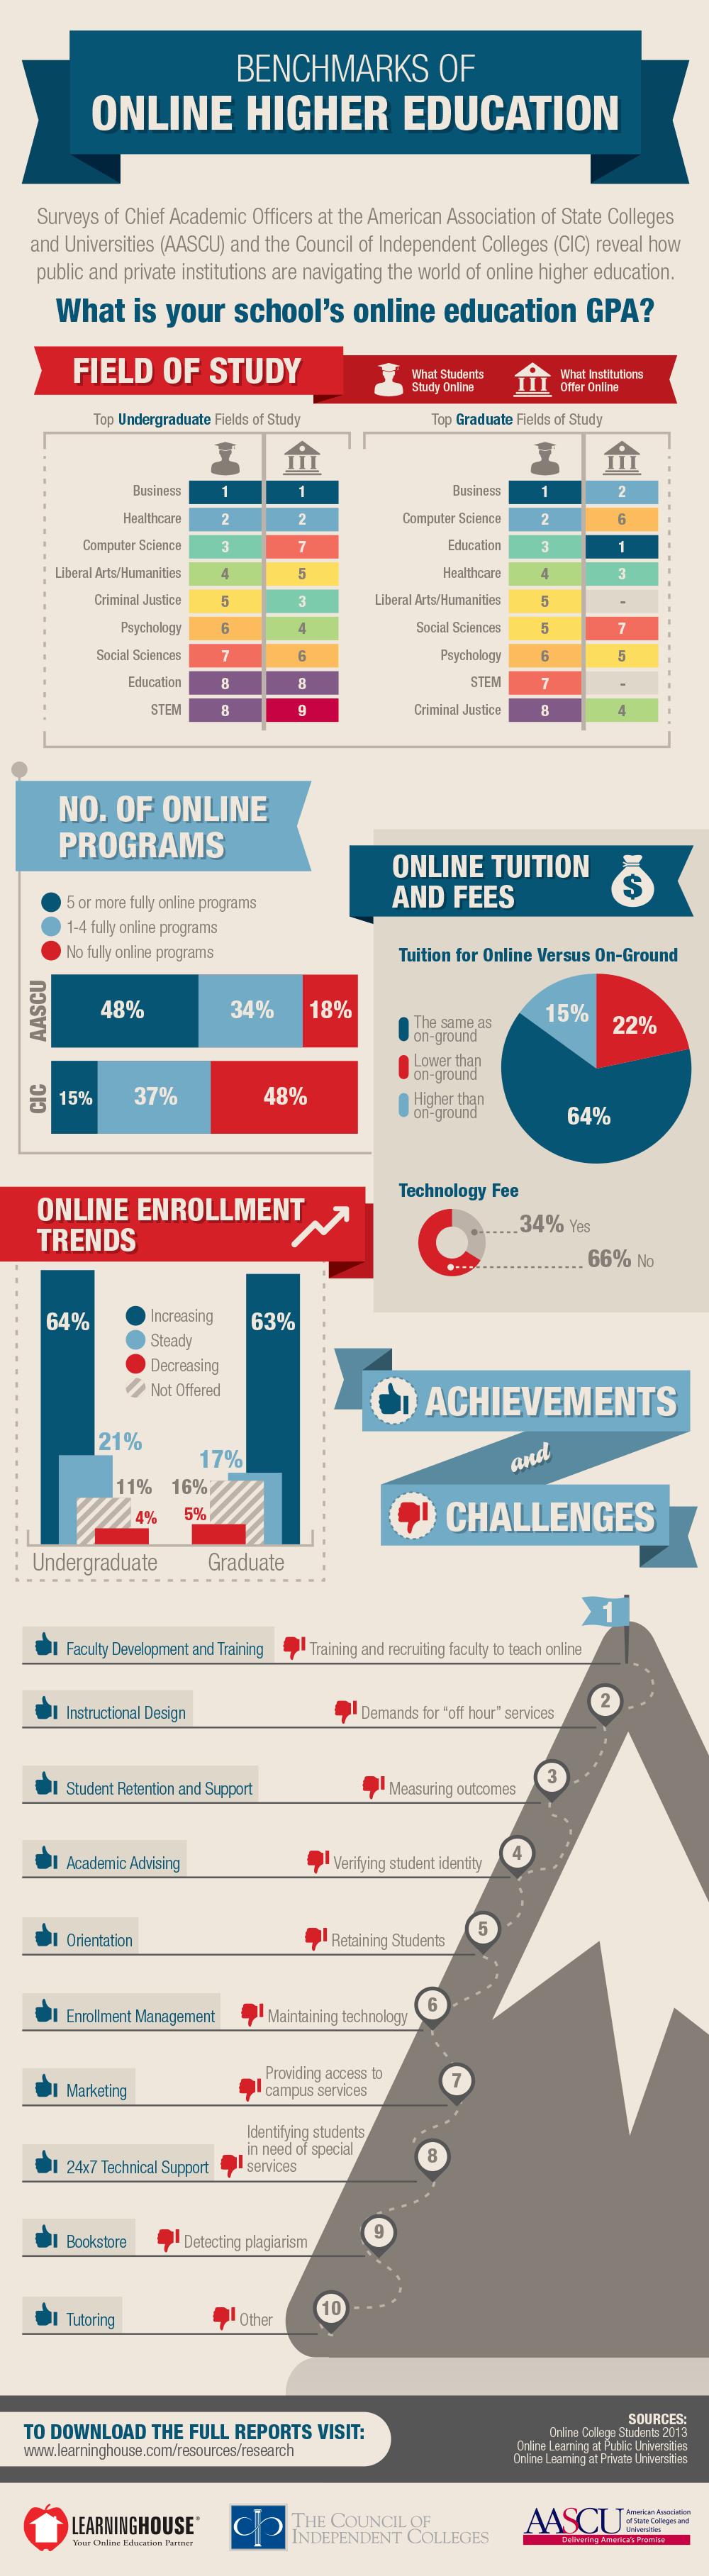 Benchmarks Of Online Higher Education